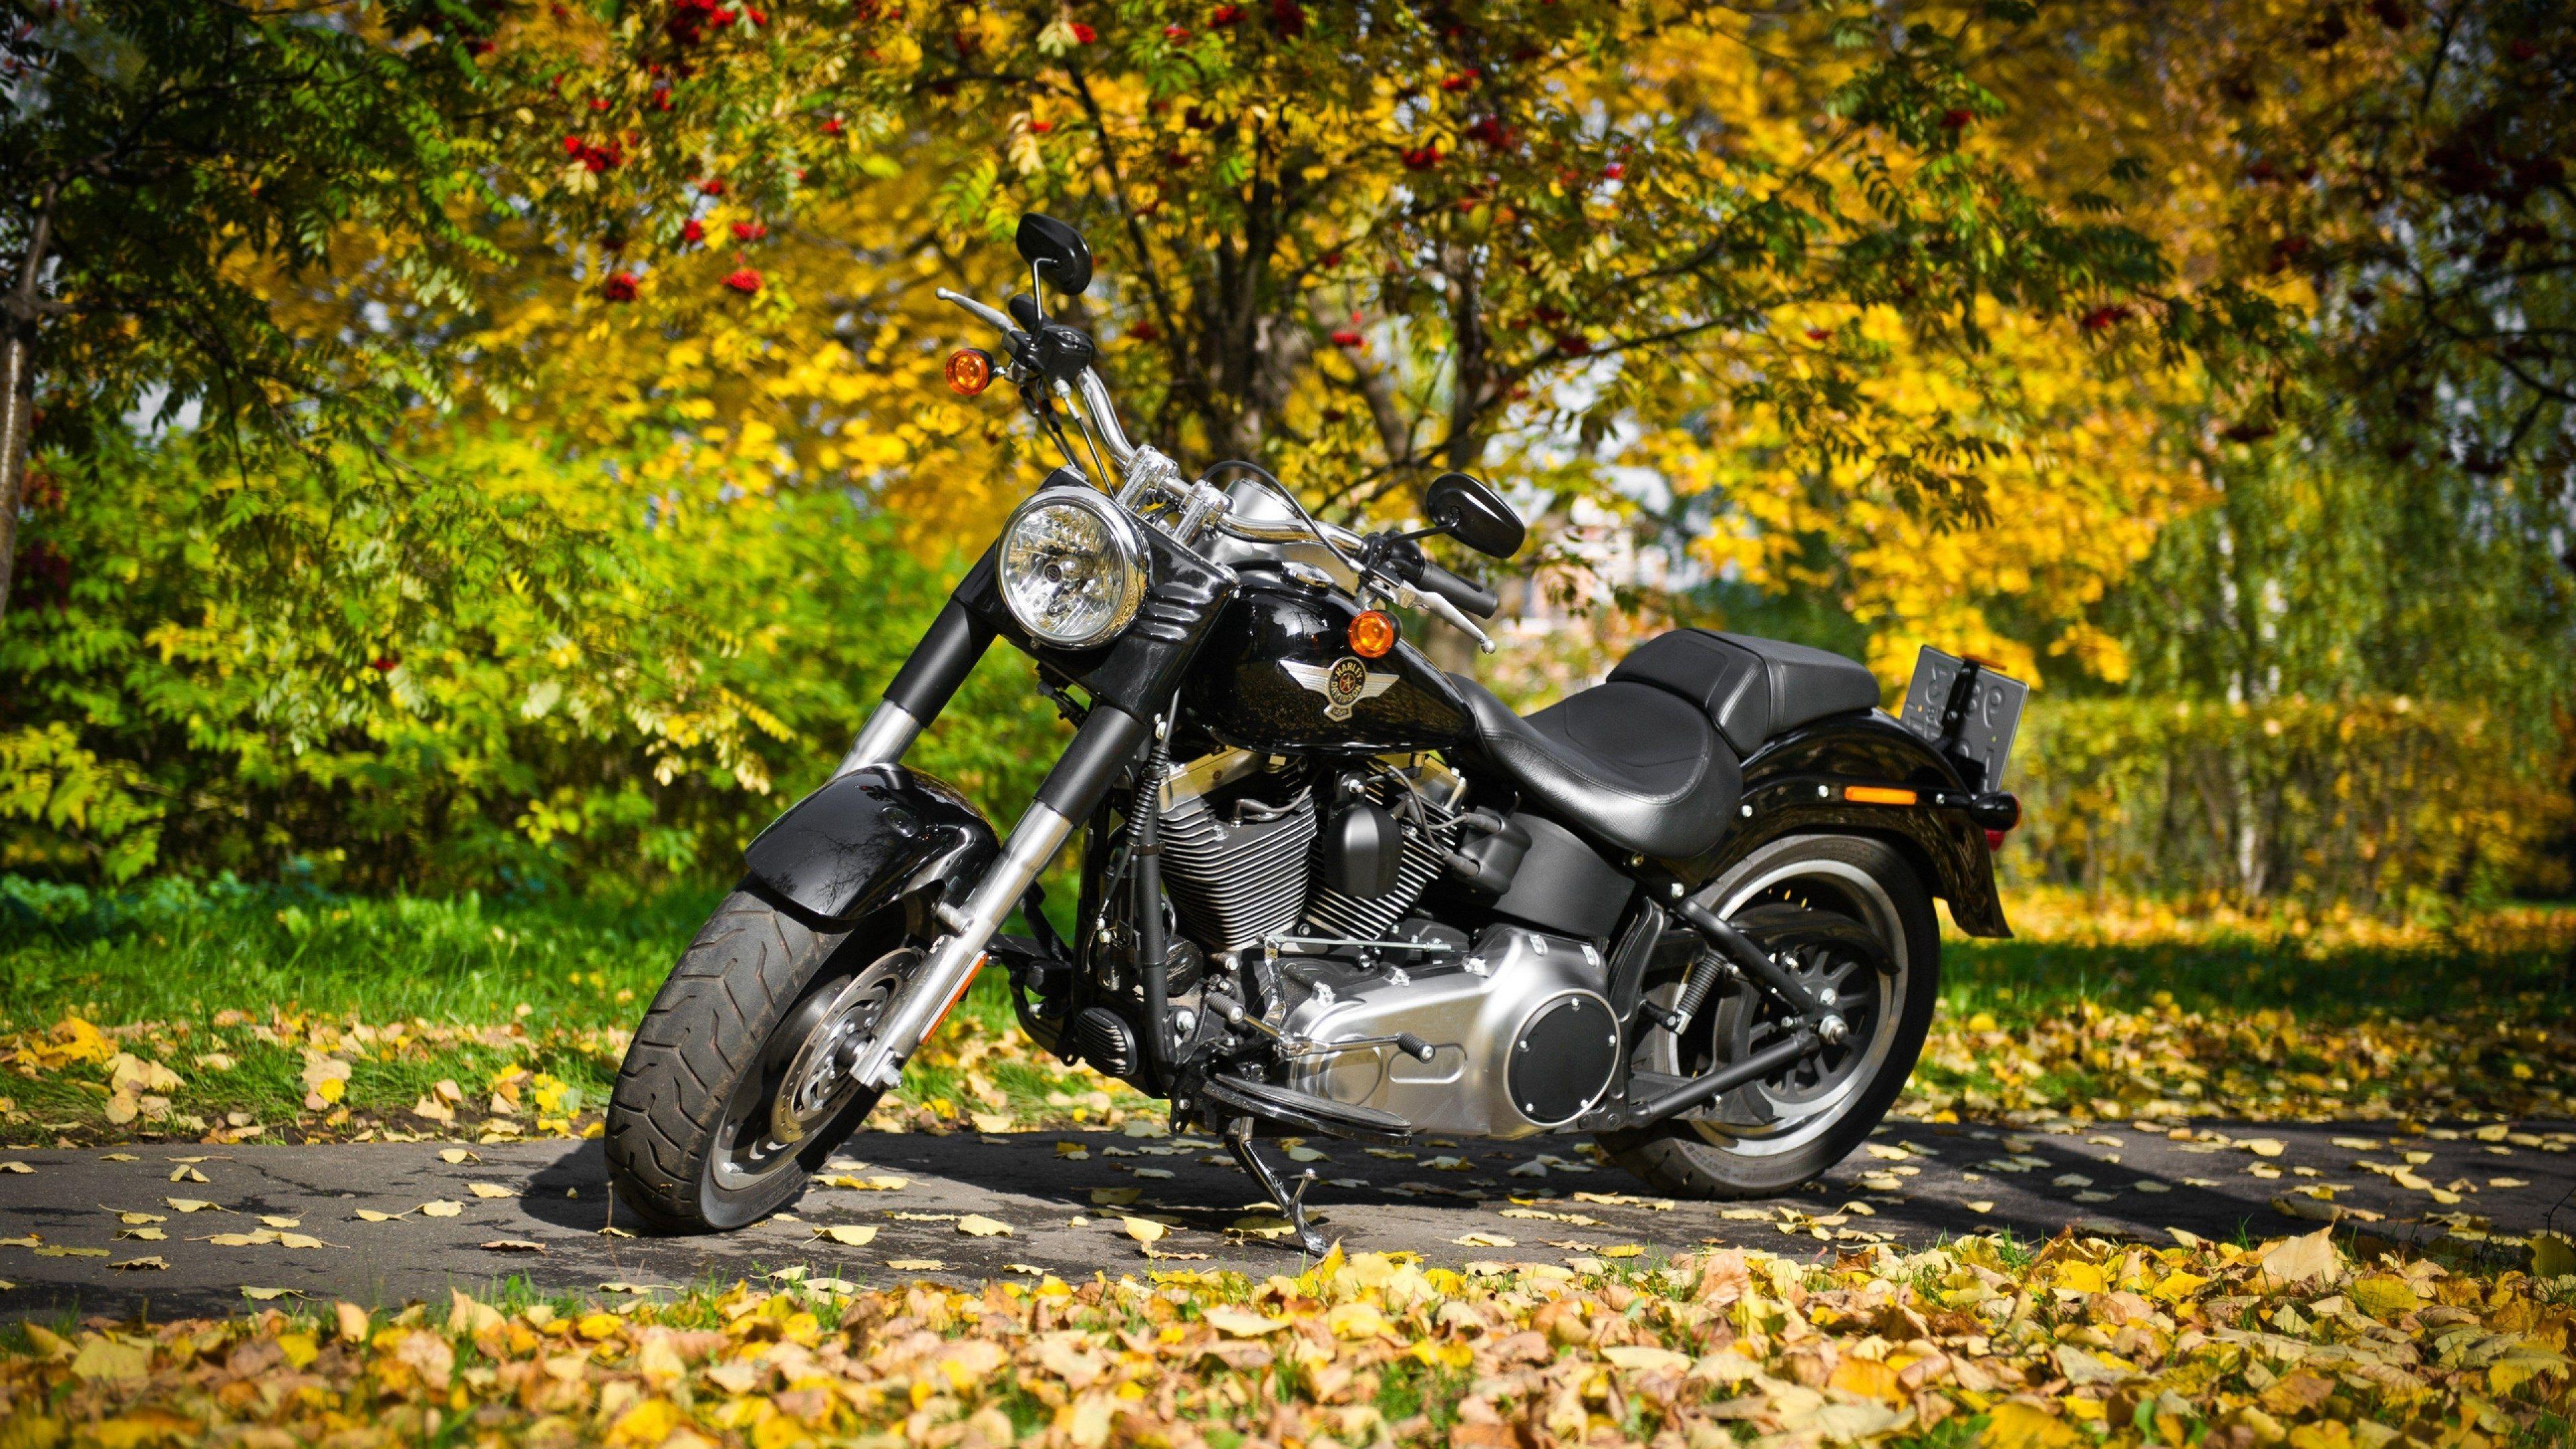 3840x2160 Harley Davidson 4k Wallpaper Desktop Free Download Harley Davidson Wallpaper Harley Davidson Motorcycle Wallpaper